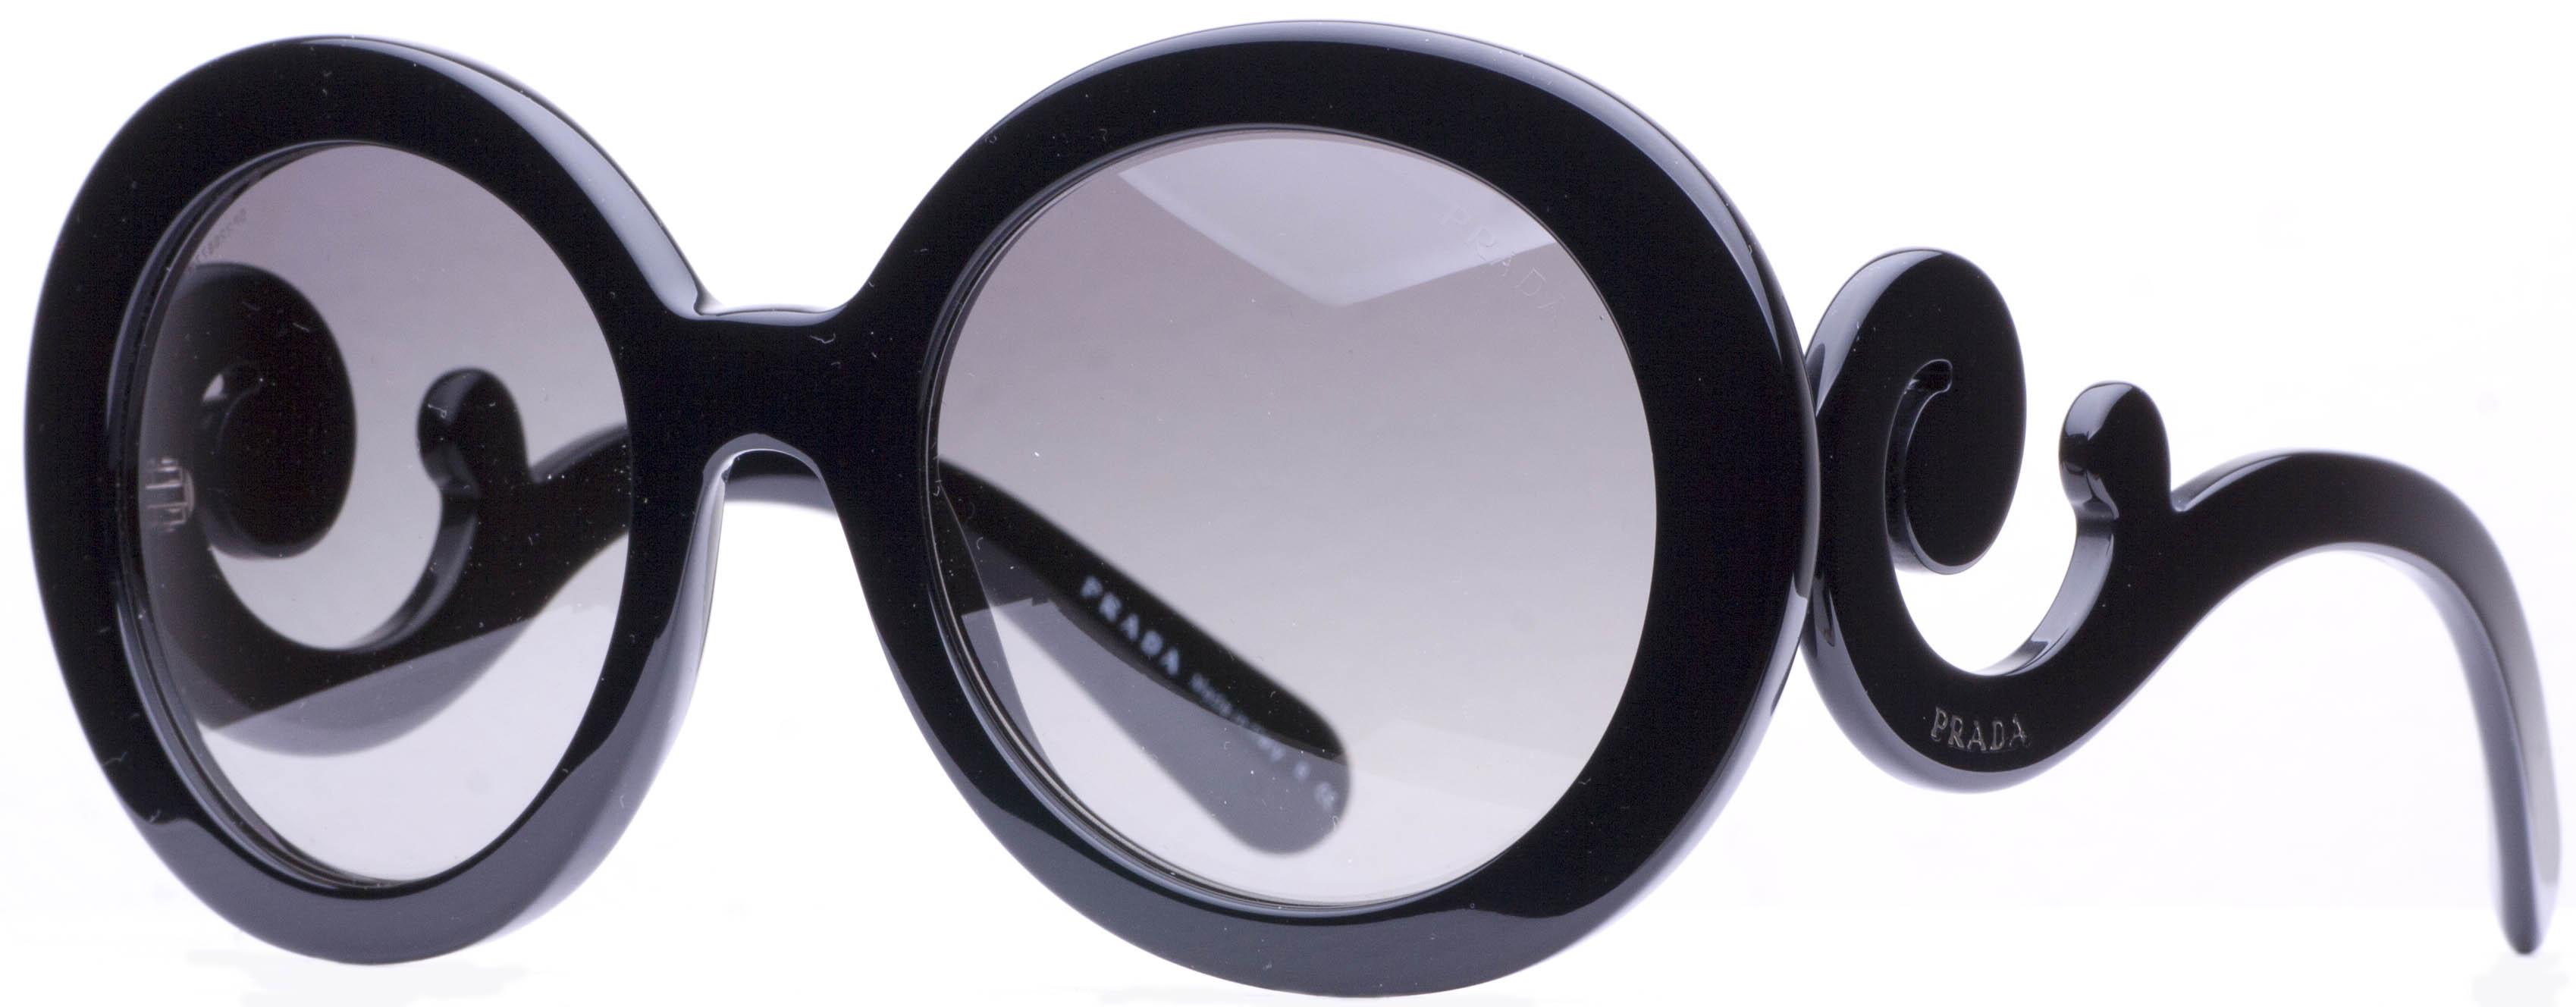 prada spr 27n round baroque swirl womens sunglasses ebay